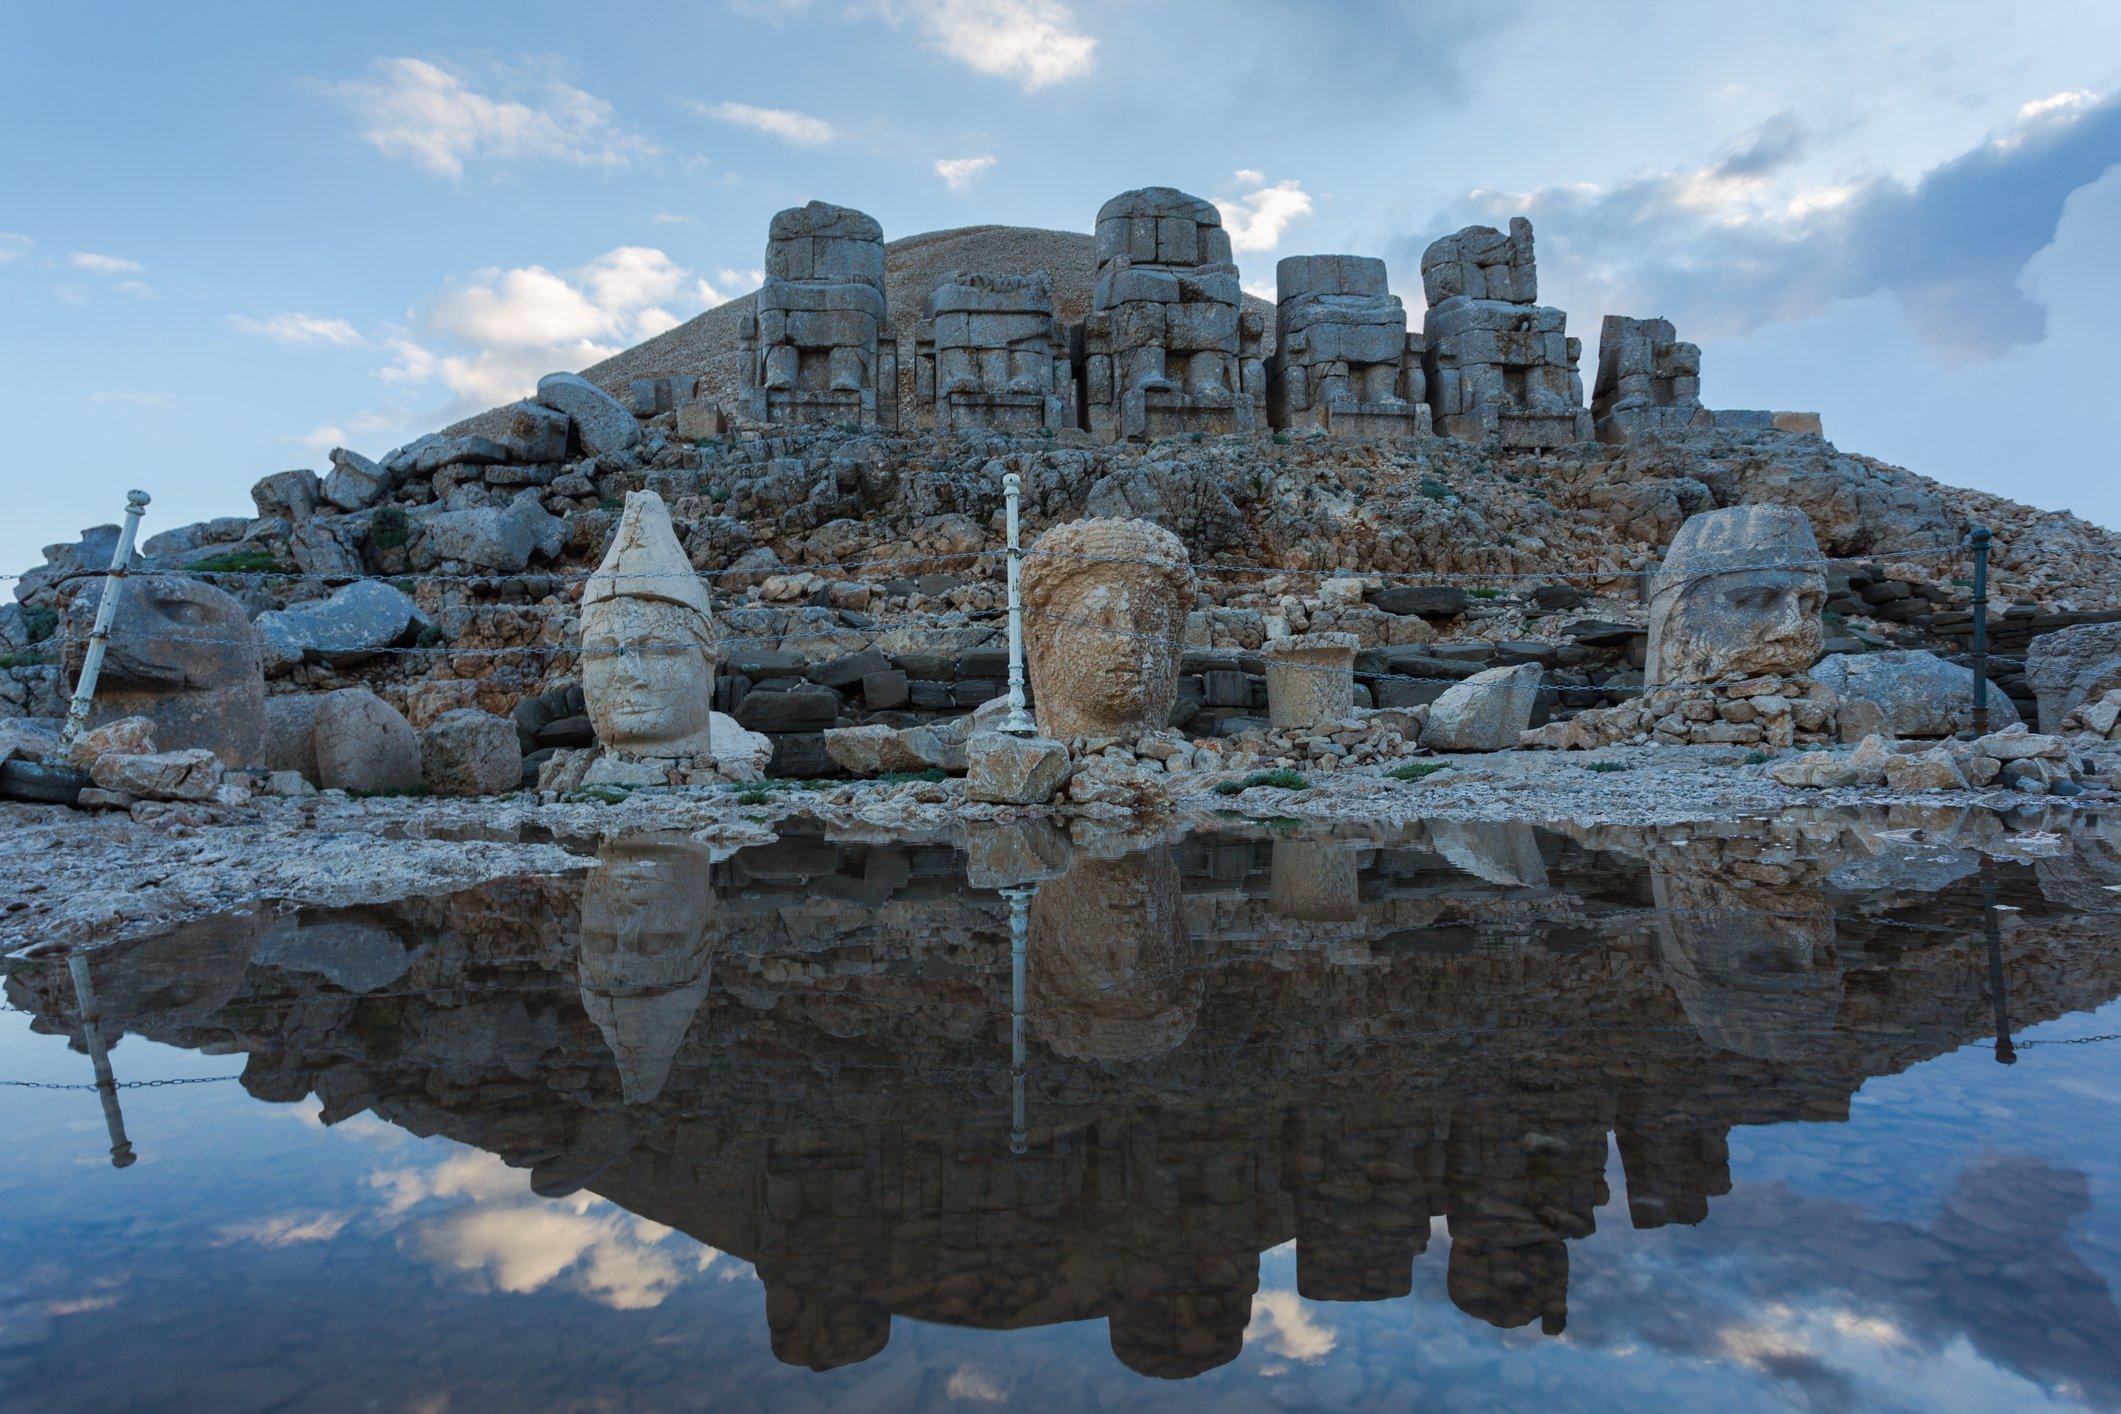 World heritage in Turkey: Nemrut, the Mountain of Gods salutes Anatolia |  Daily Sabah